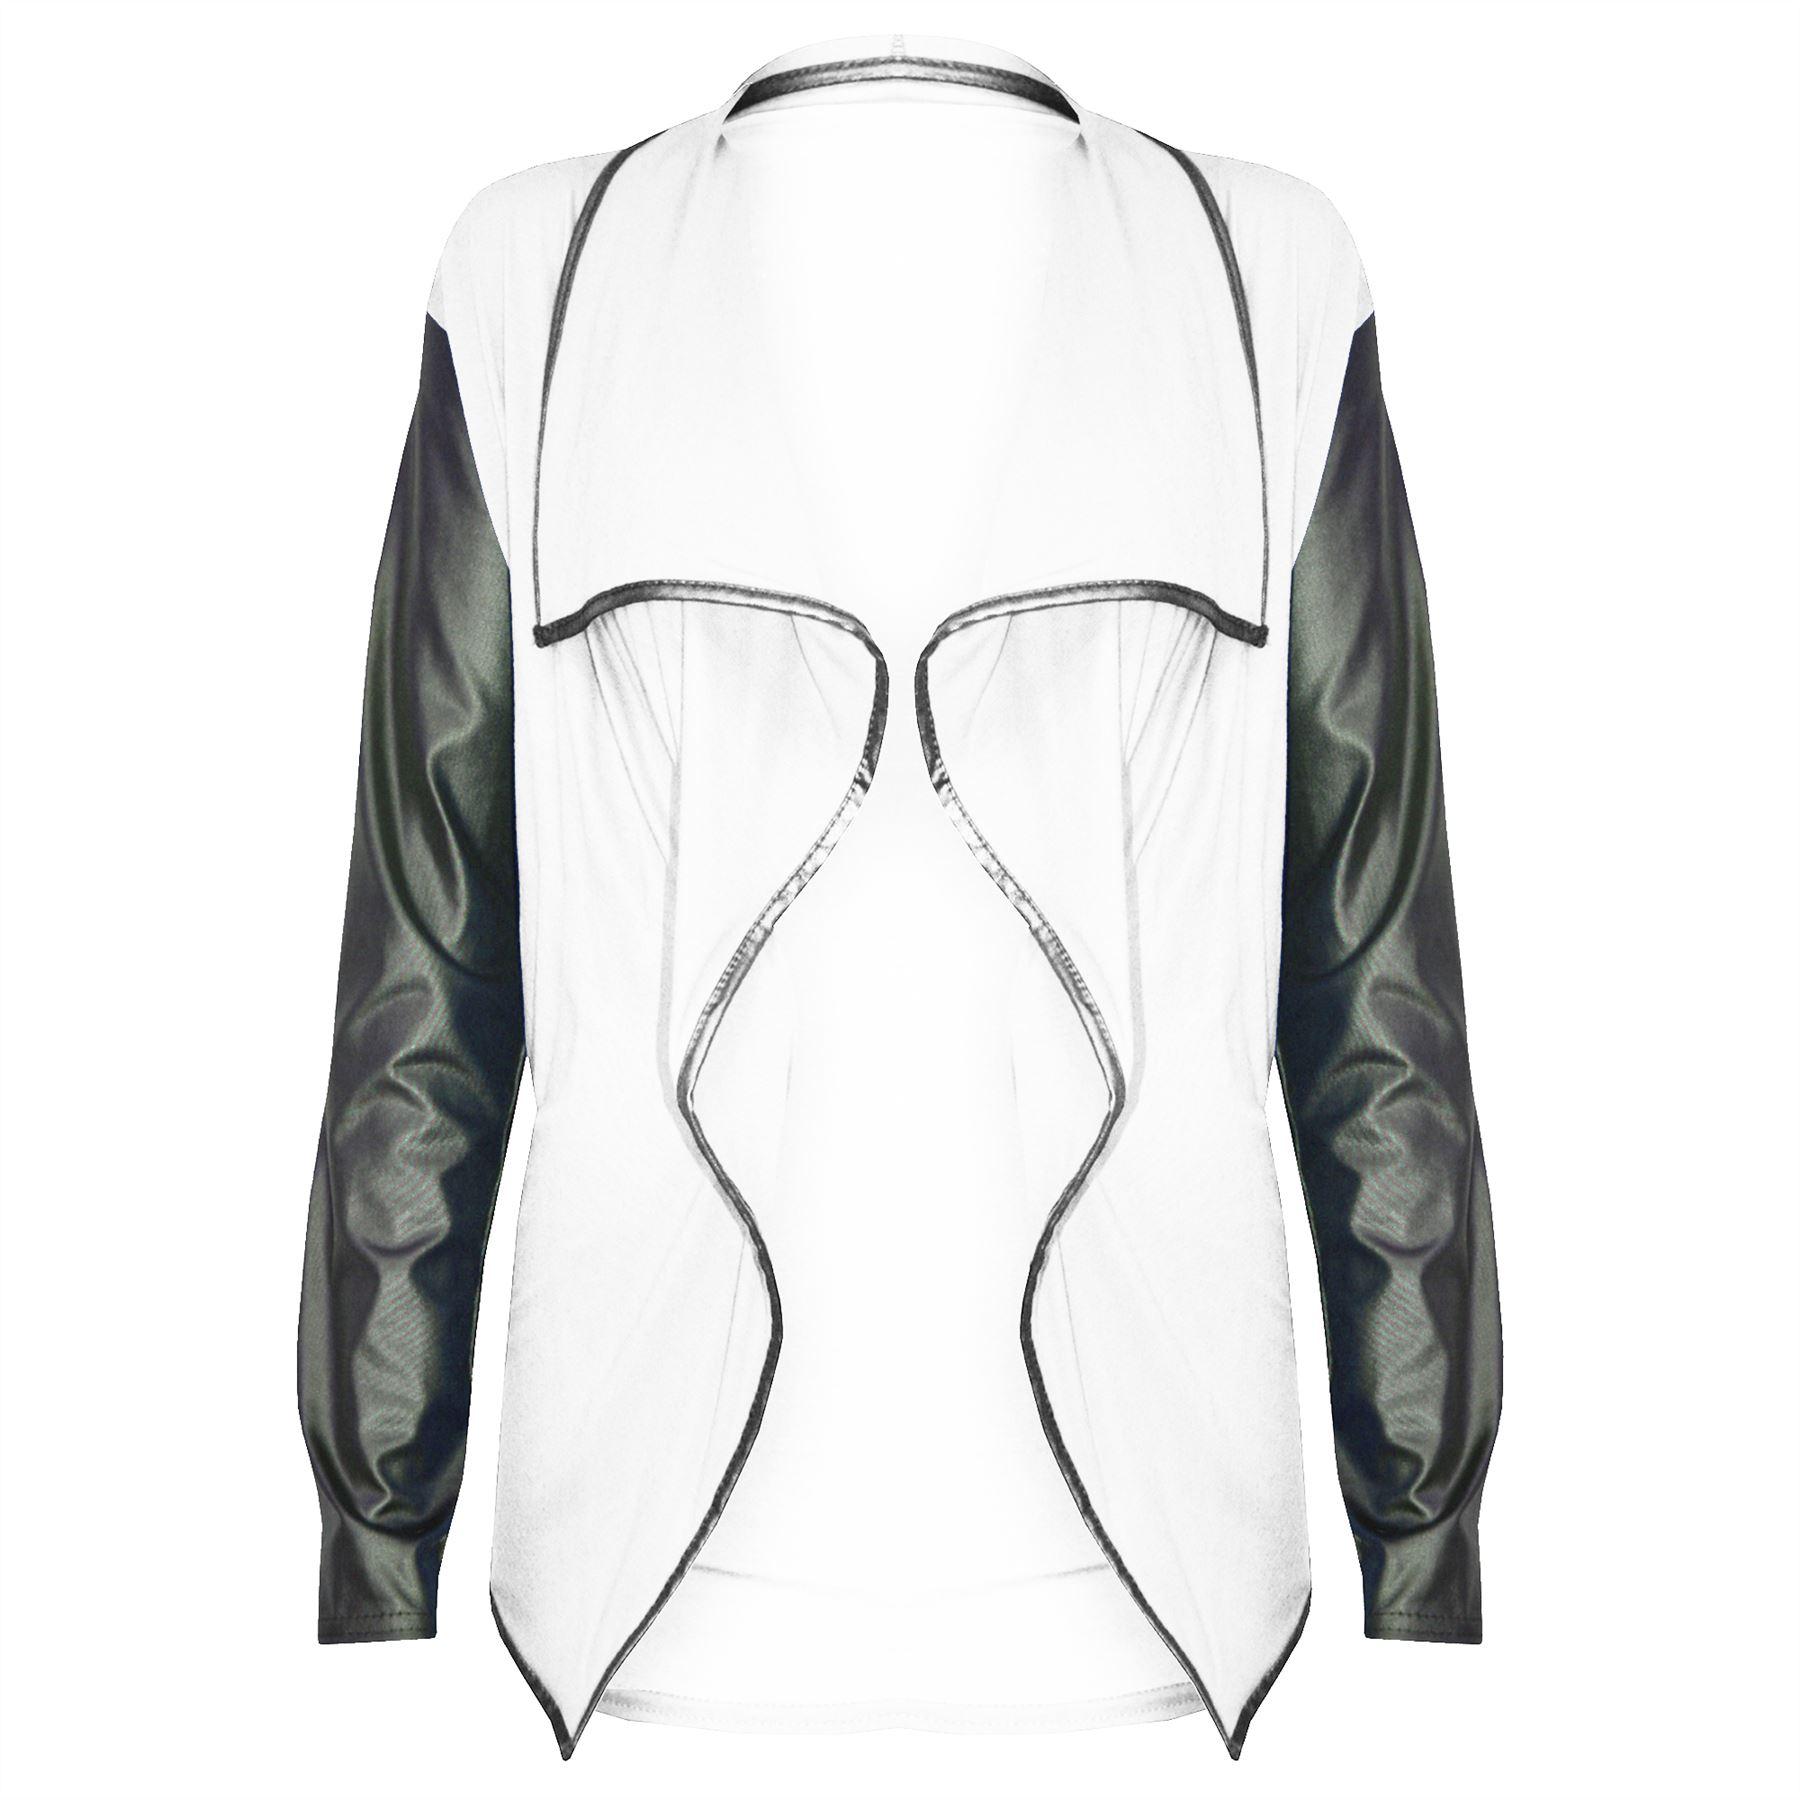 Womens-Ladies-Open-Waterfall-PVC-Wet-Look-Long-Sleeves-Front-Blazer-Cardigan-Top thumbnail 5